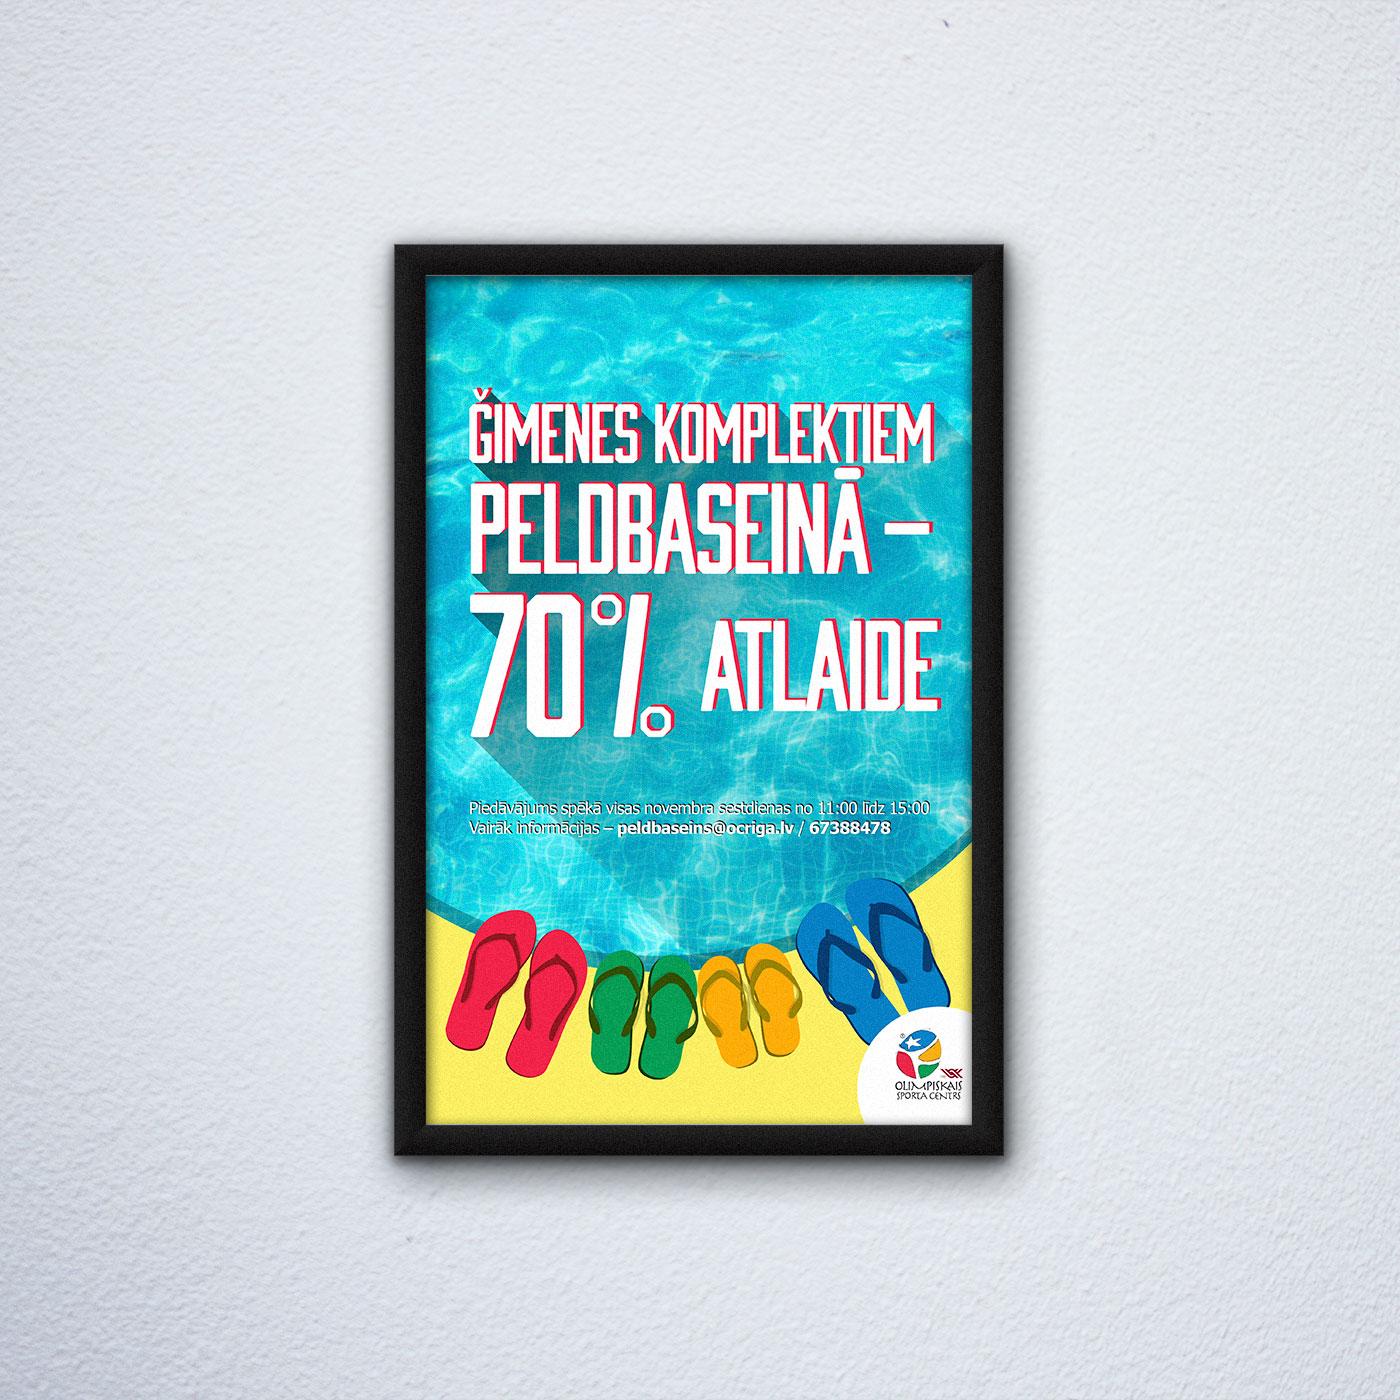 JekabsonsDotCom_OSC_OlimpiskaisSportaCentrs_Poster_GimenesKomplektsPeldbaseins_Atlaide